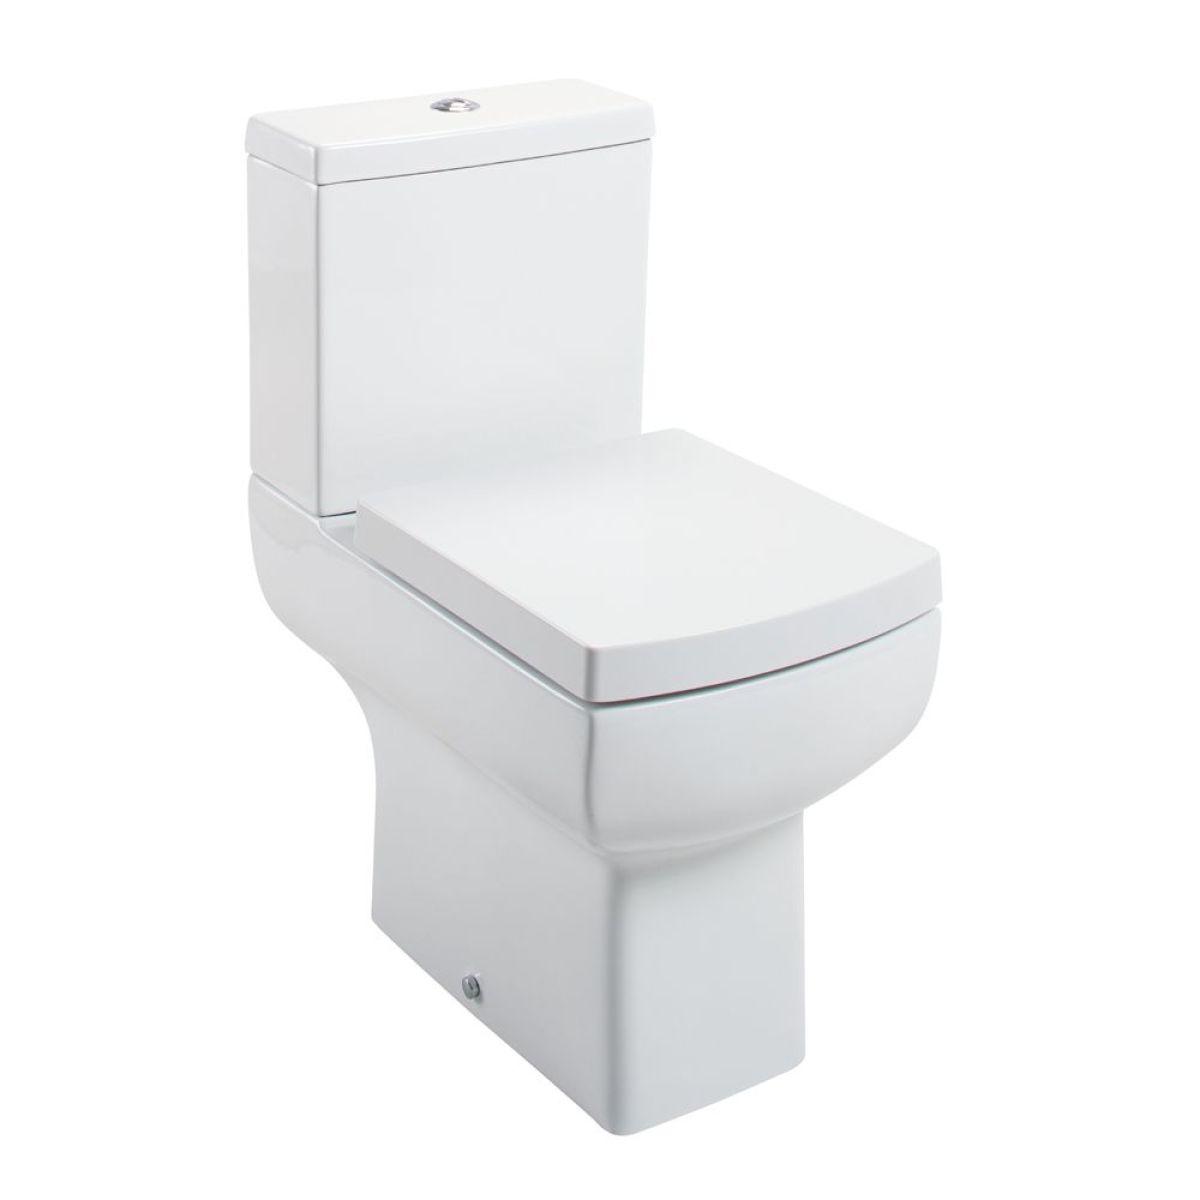 Cassellie Daisy Lou Close Coupled Toilet